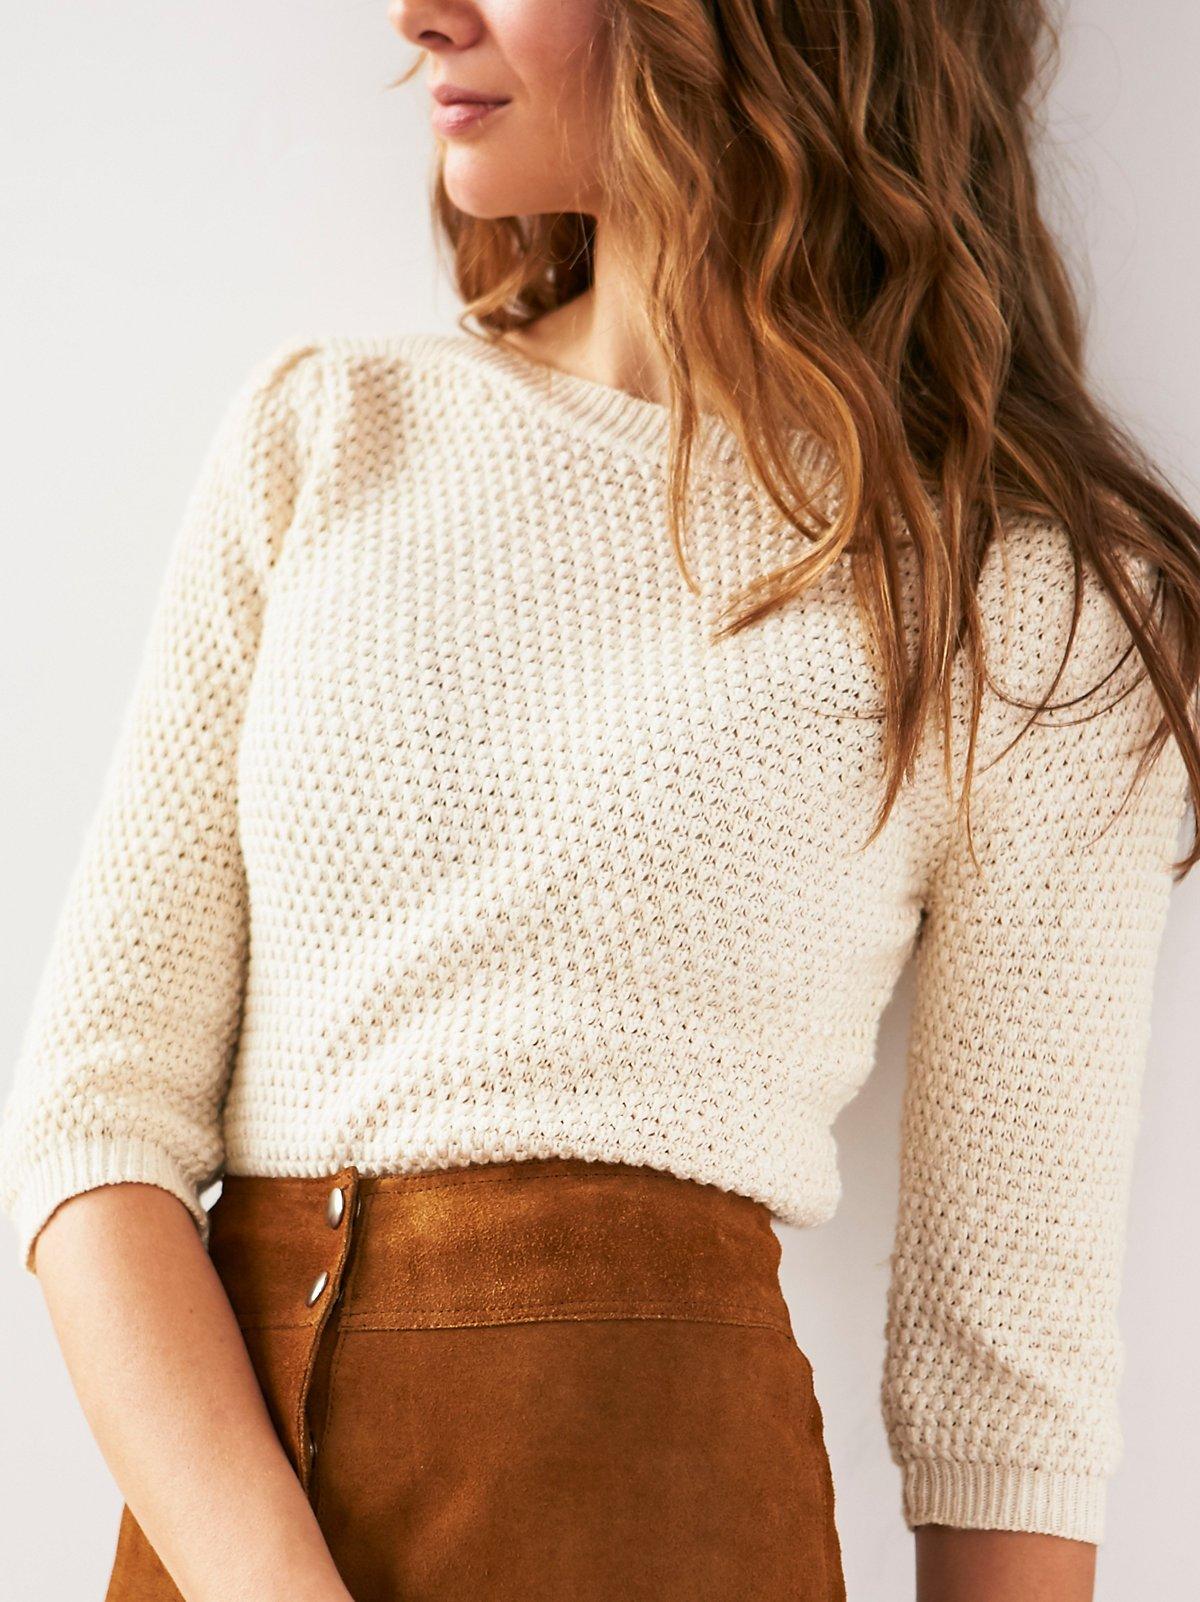 Vintage 70s Knit Top